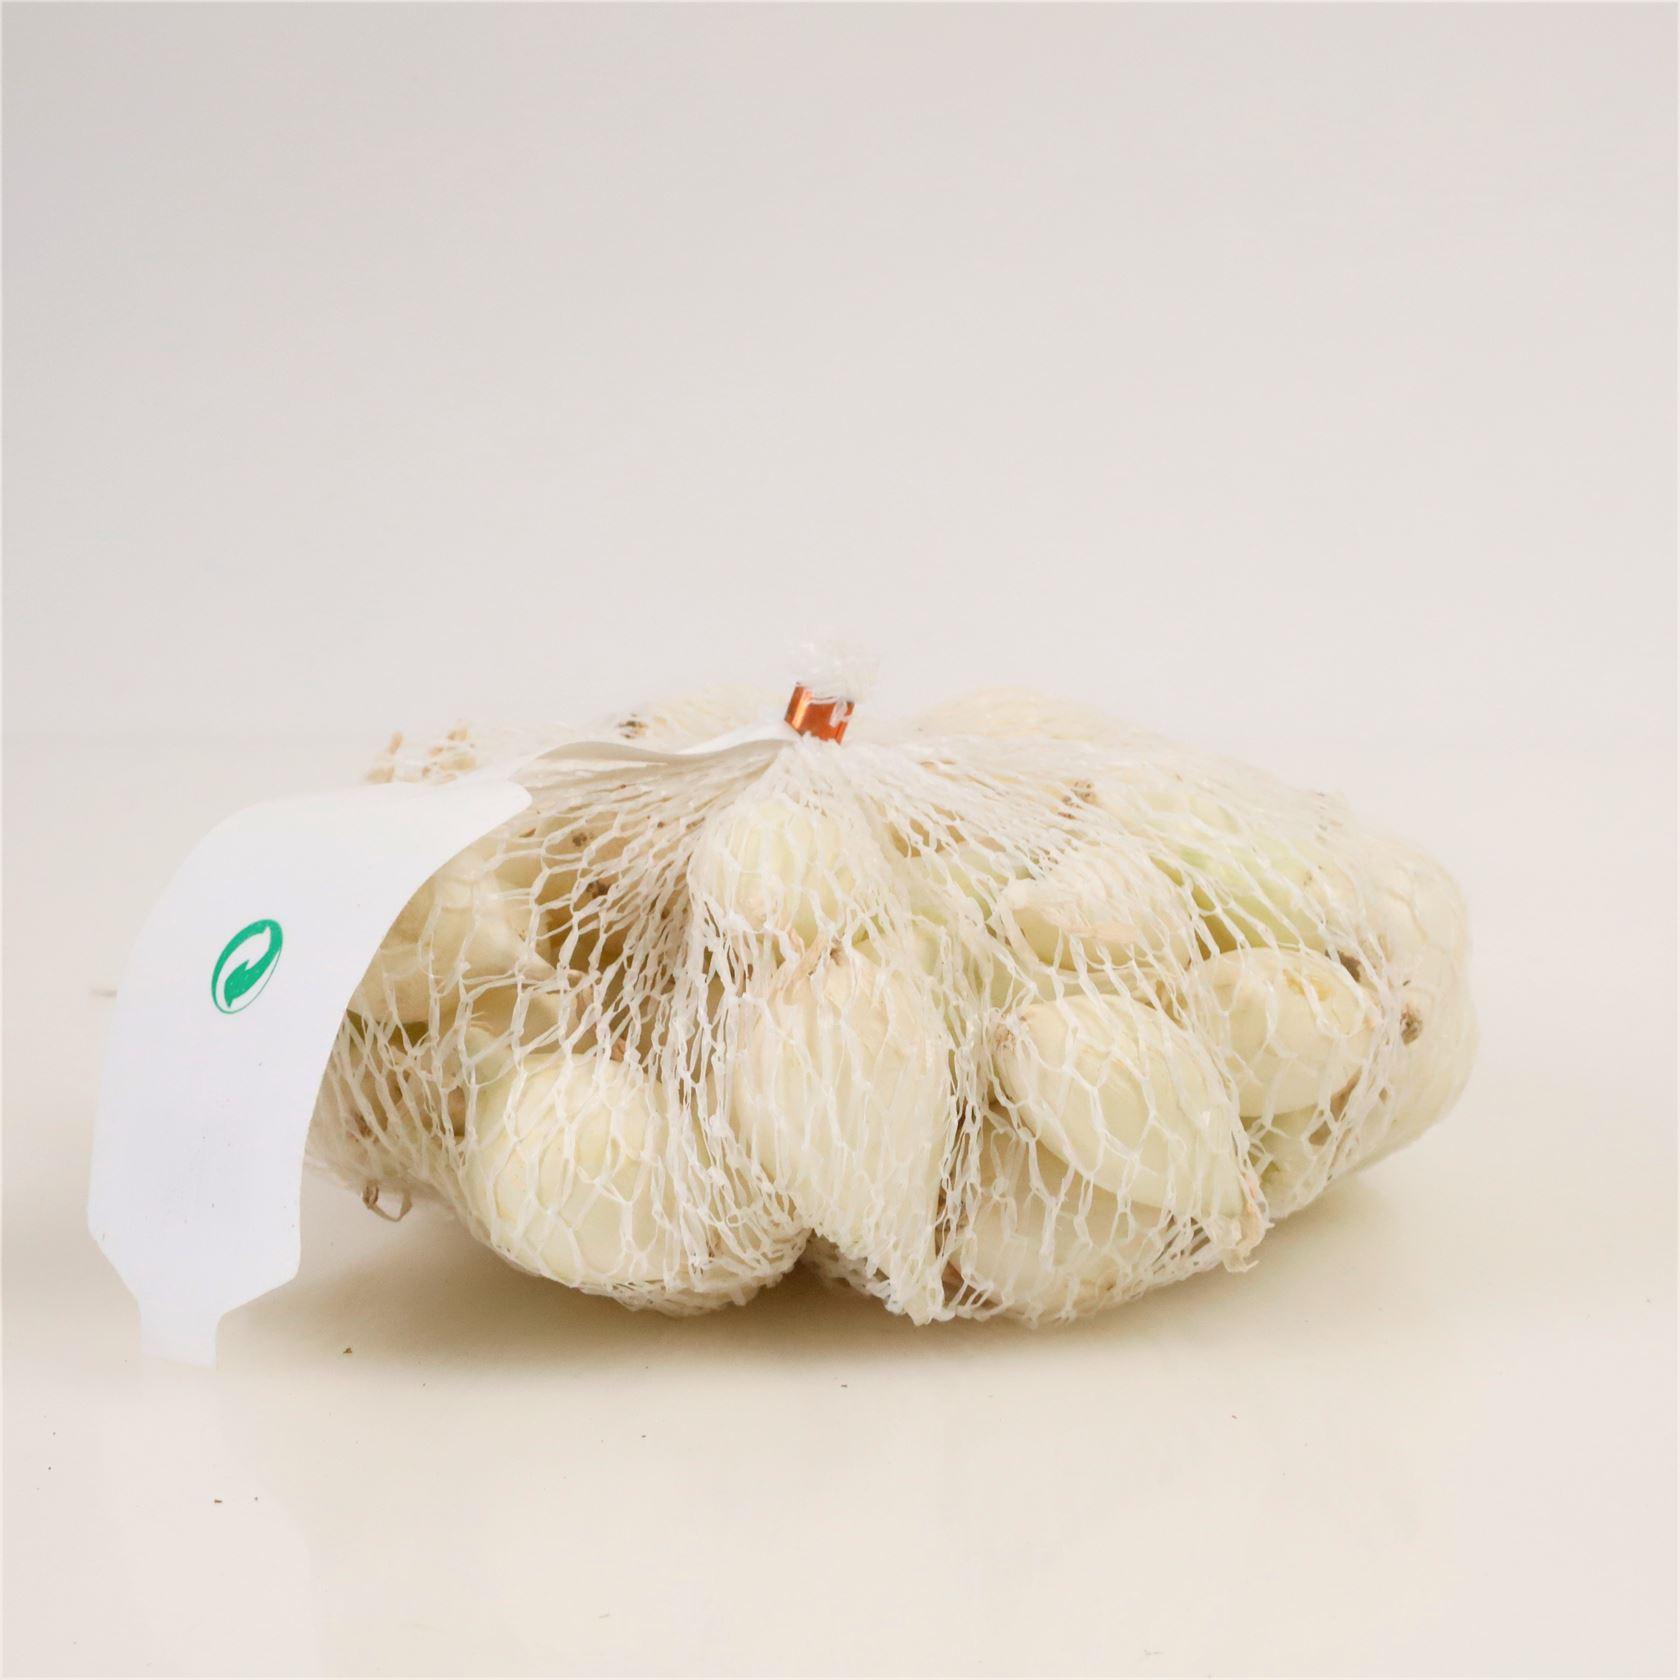 Winter-plantui-Snowball-wit-netje-van-250gram